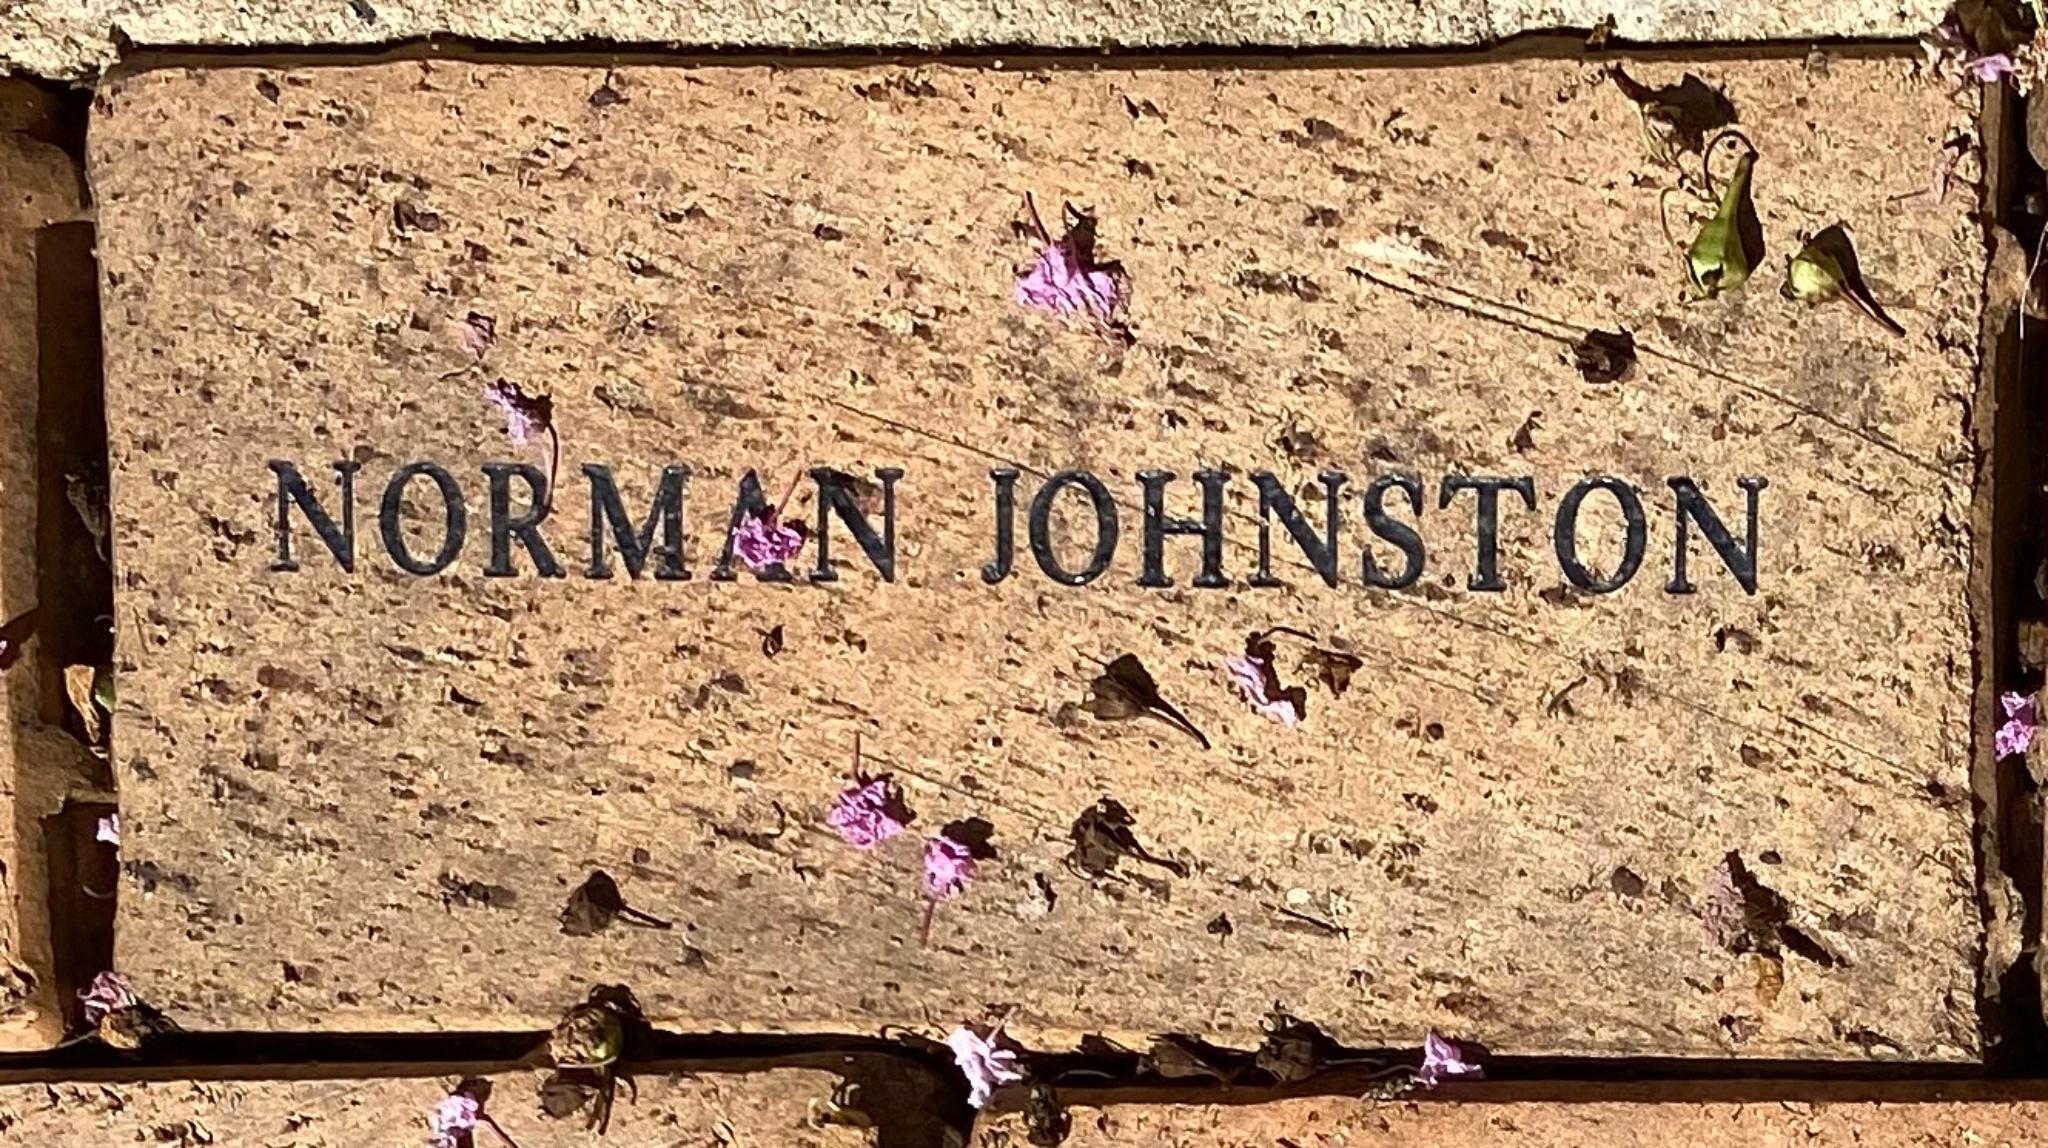 NORMAN JOHNSTON